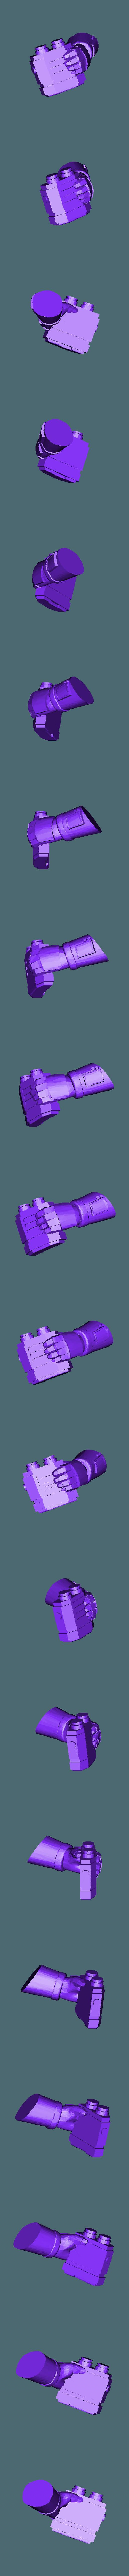 eliminator_binos.stl Download free STL file Eliminator sniper #1 • Design to 3D print, KarnageKing